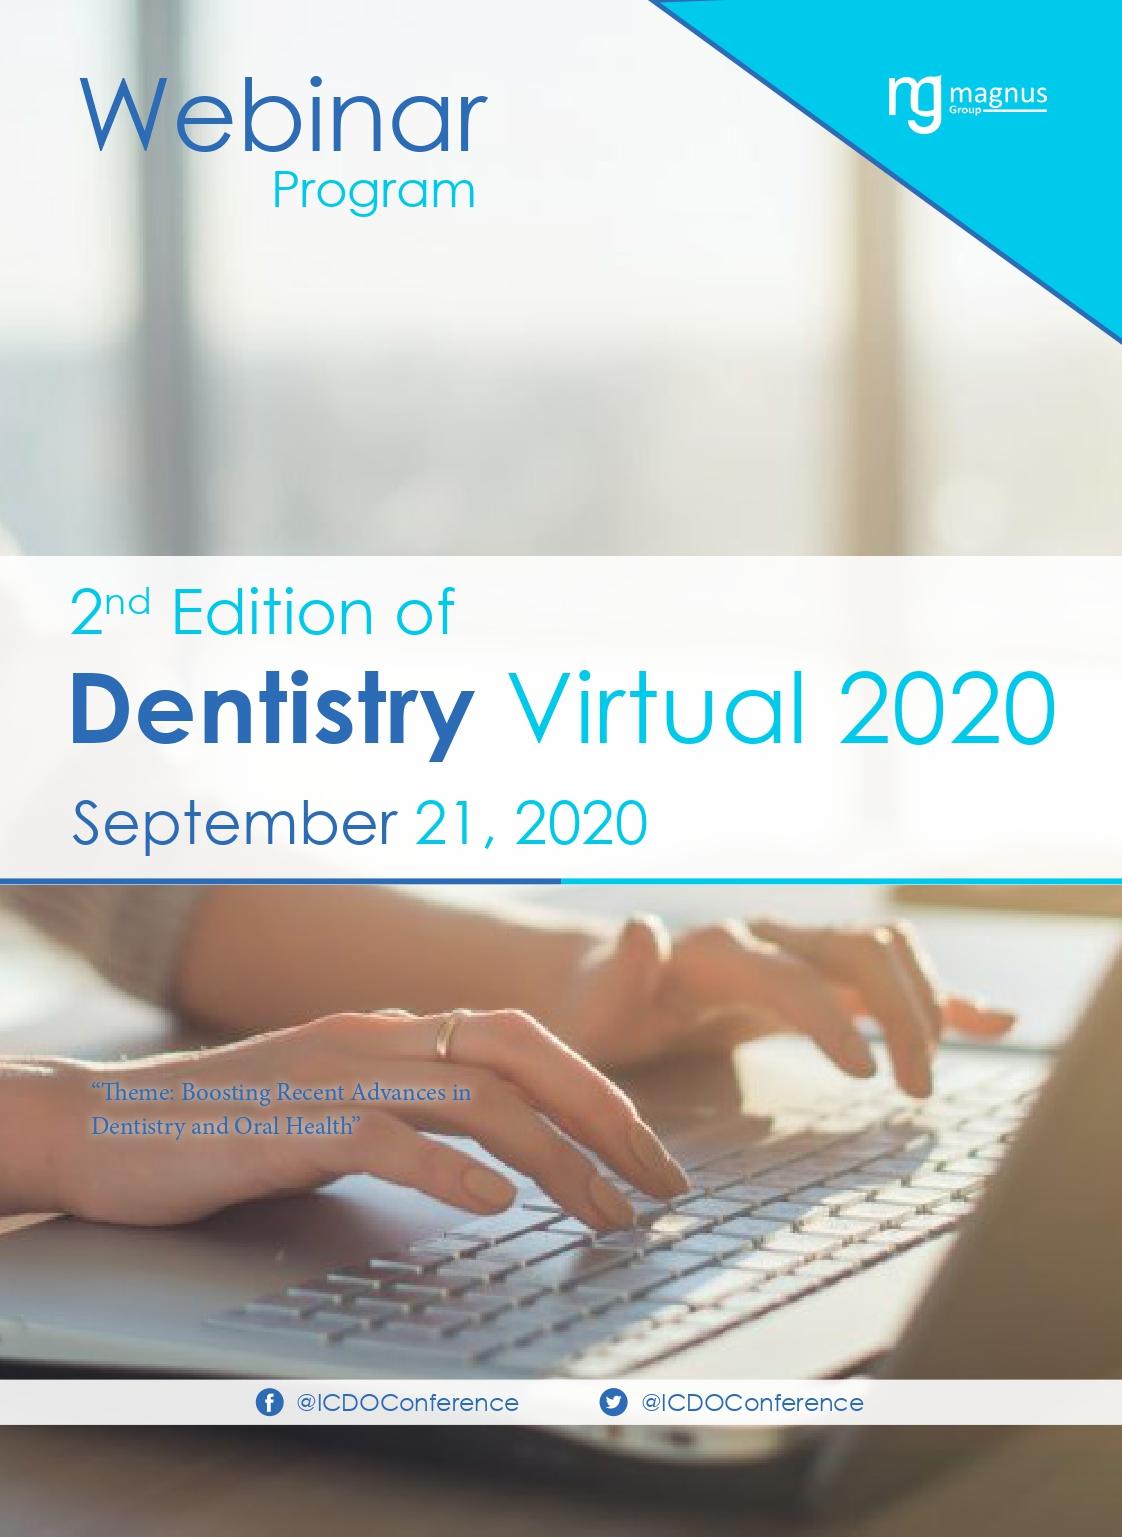 2nd Edition of International Webinar on Dentistry and Oral Health | Online Event Program